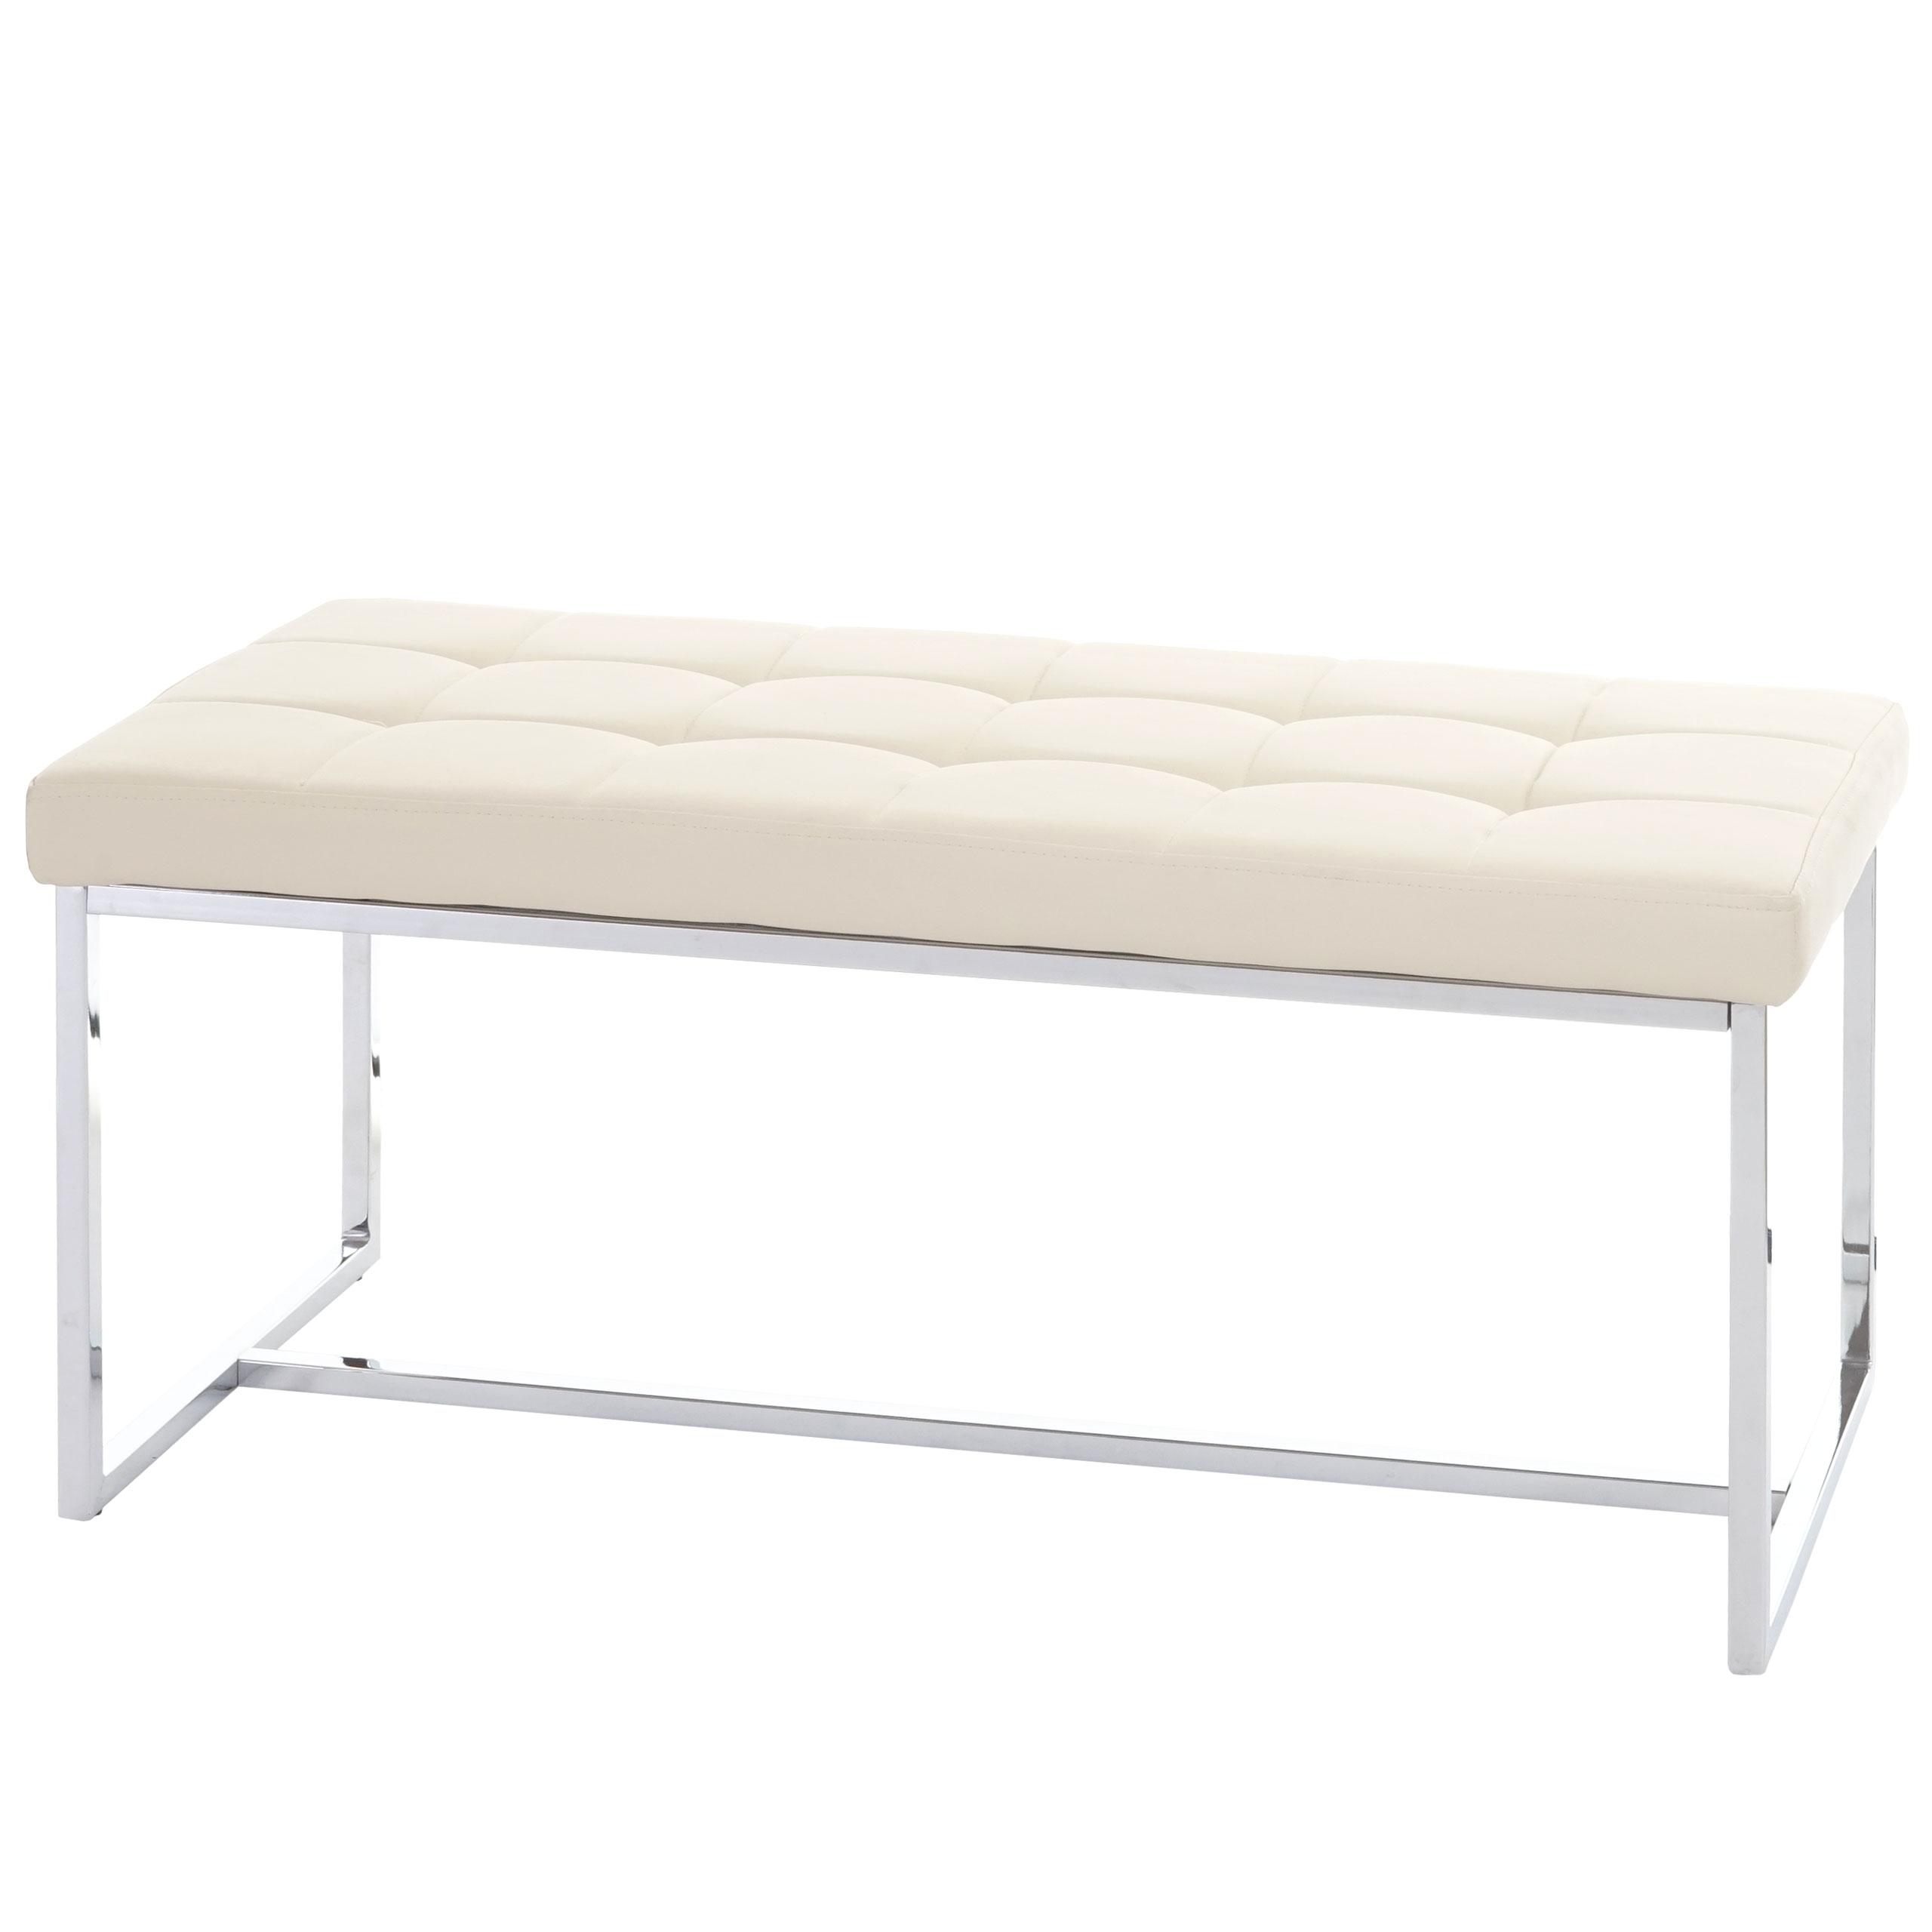 sitzbank tivoli polsterbank bank esszimmerbank 100 120cm ebay. Black Bedroom Furniture Sets. Home Design Ideas